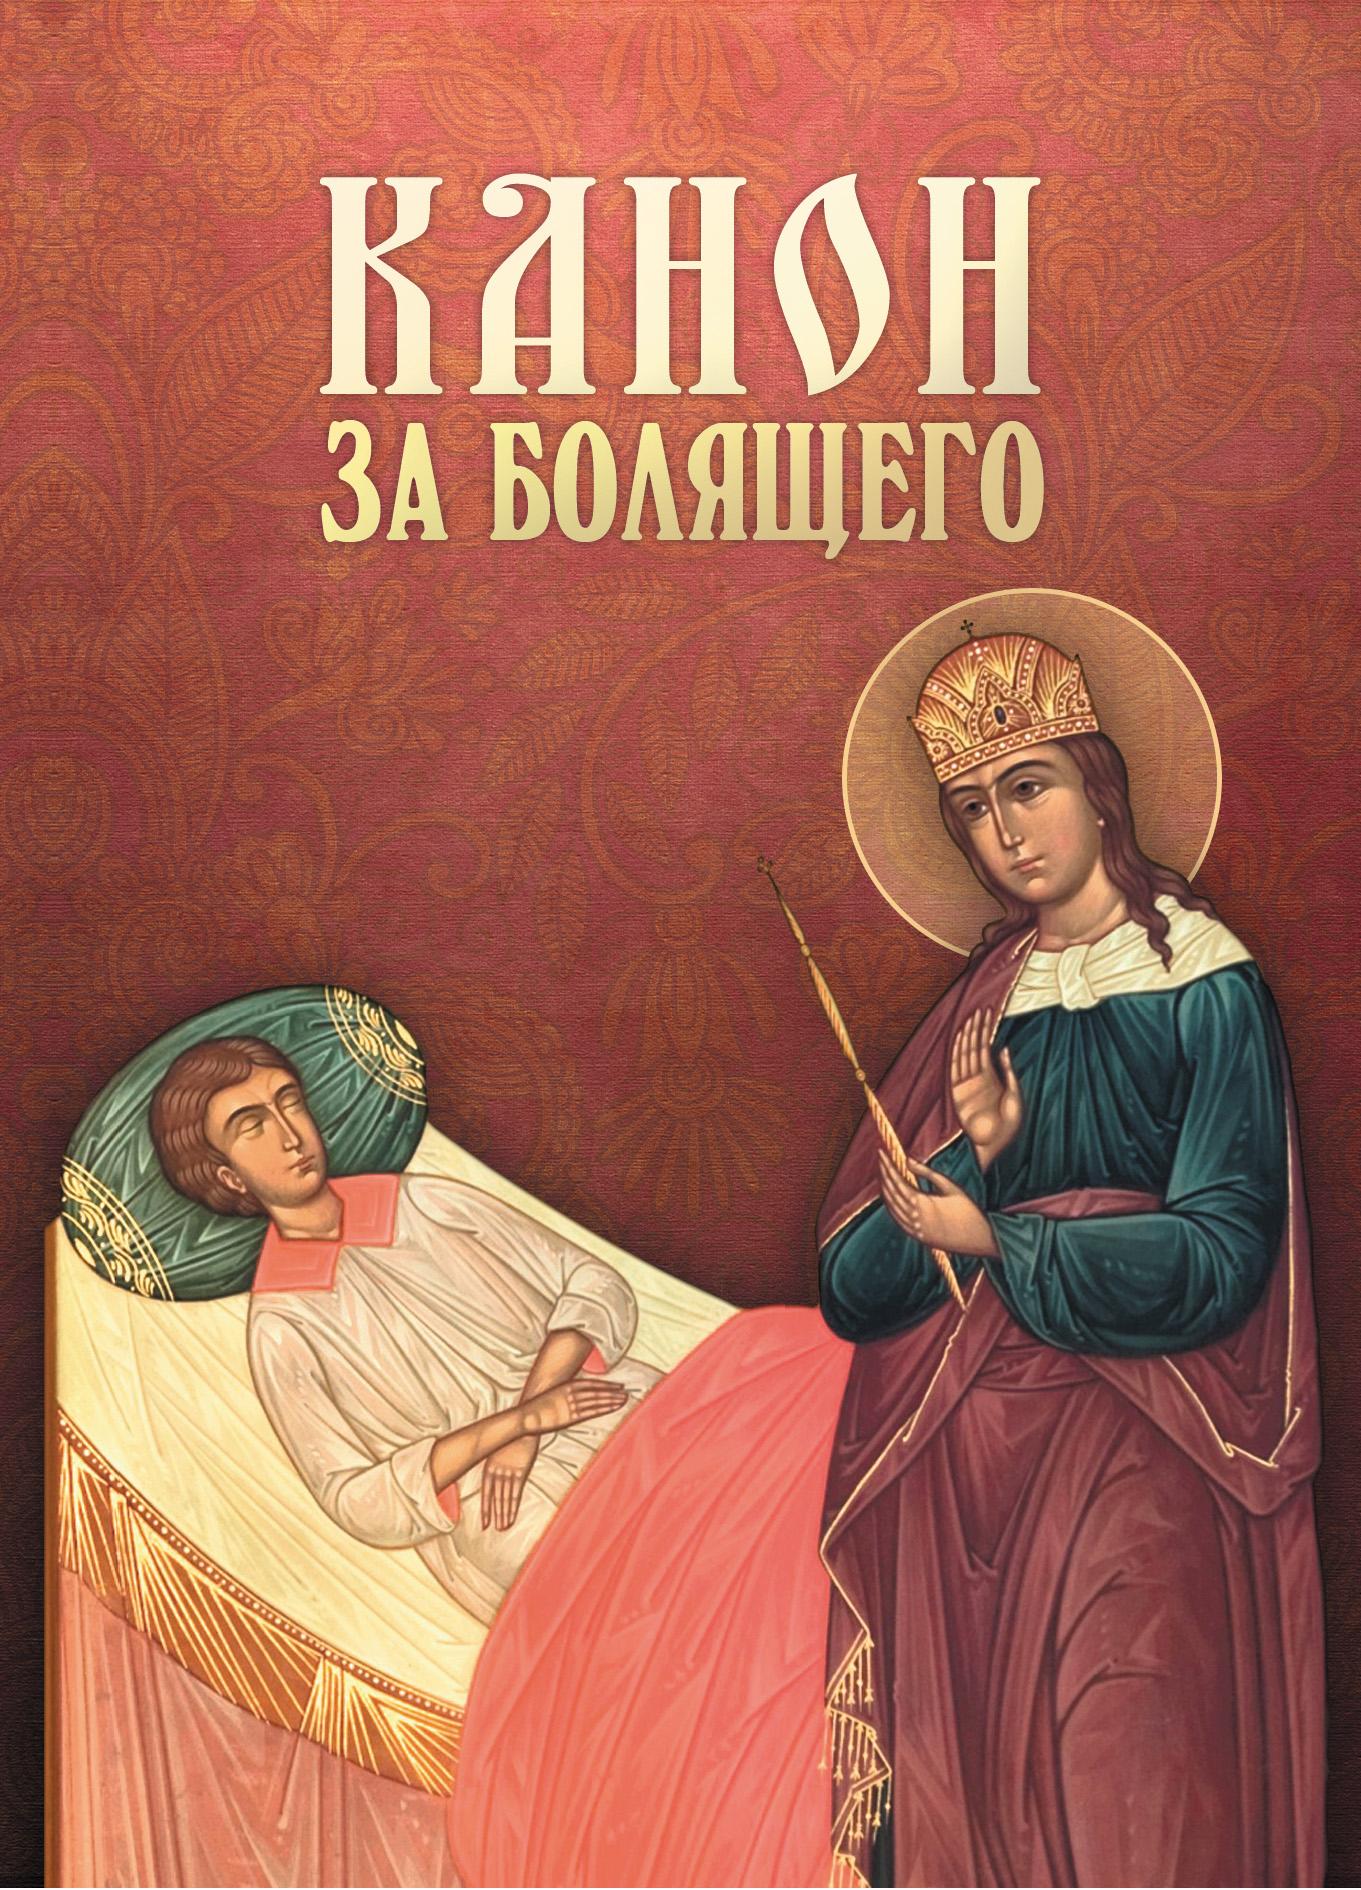 Сборник Канон за болящего канон за болящего с приложением молитв об исцелении болящих